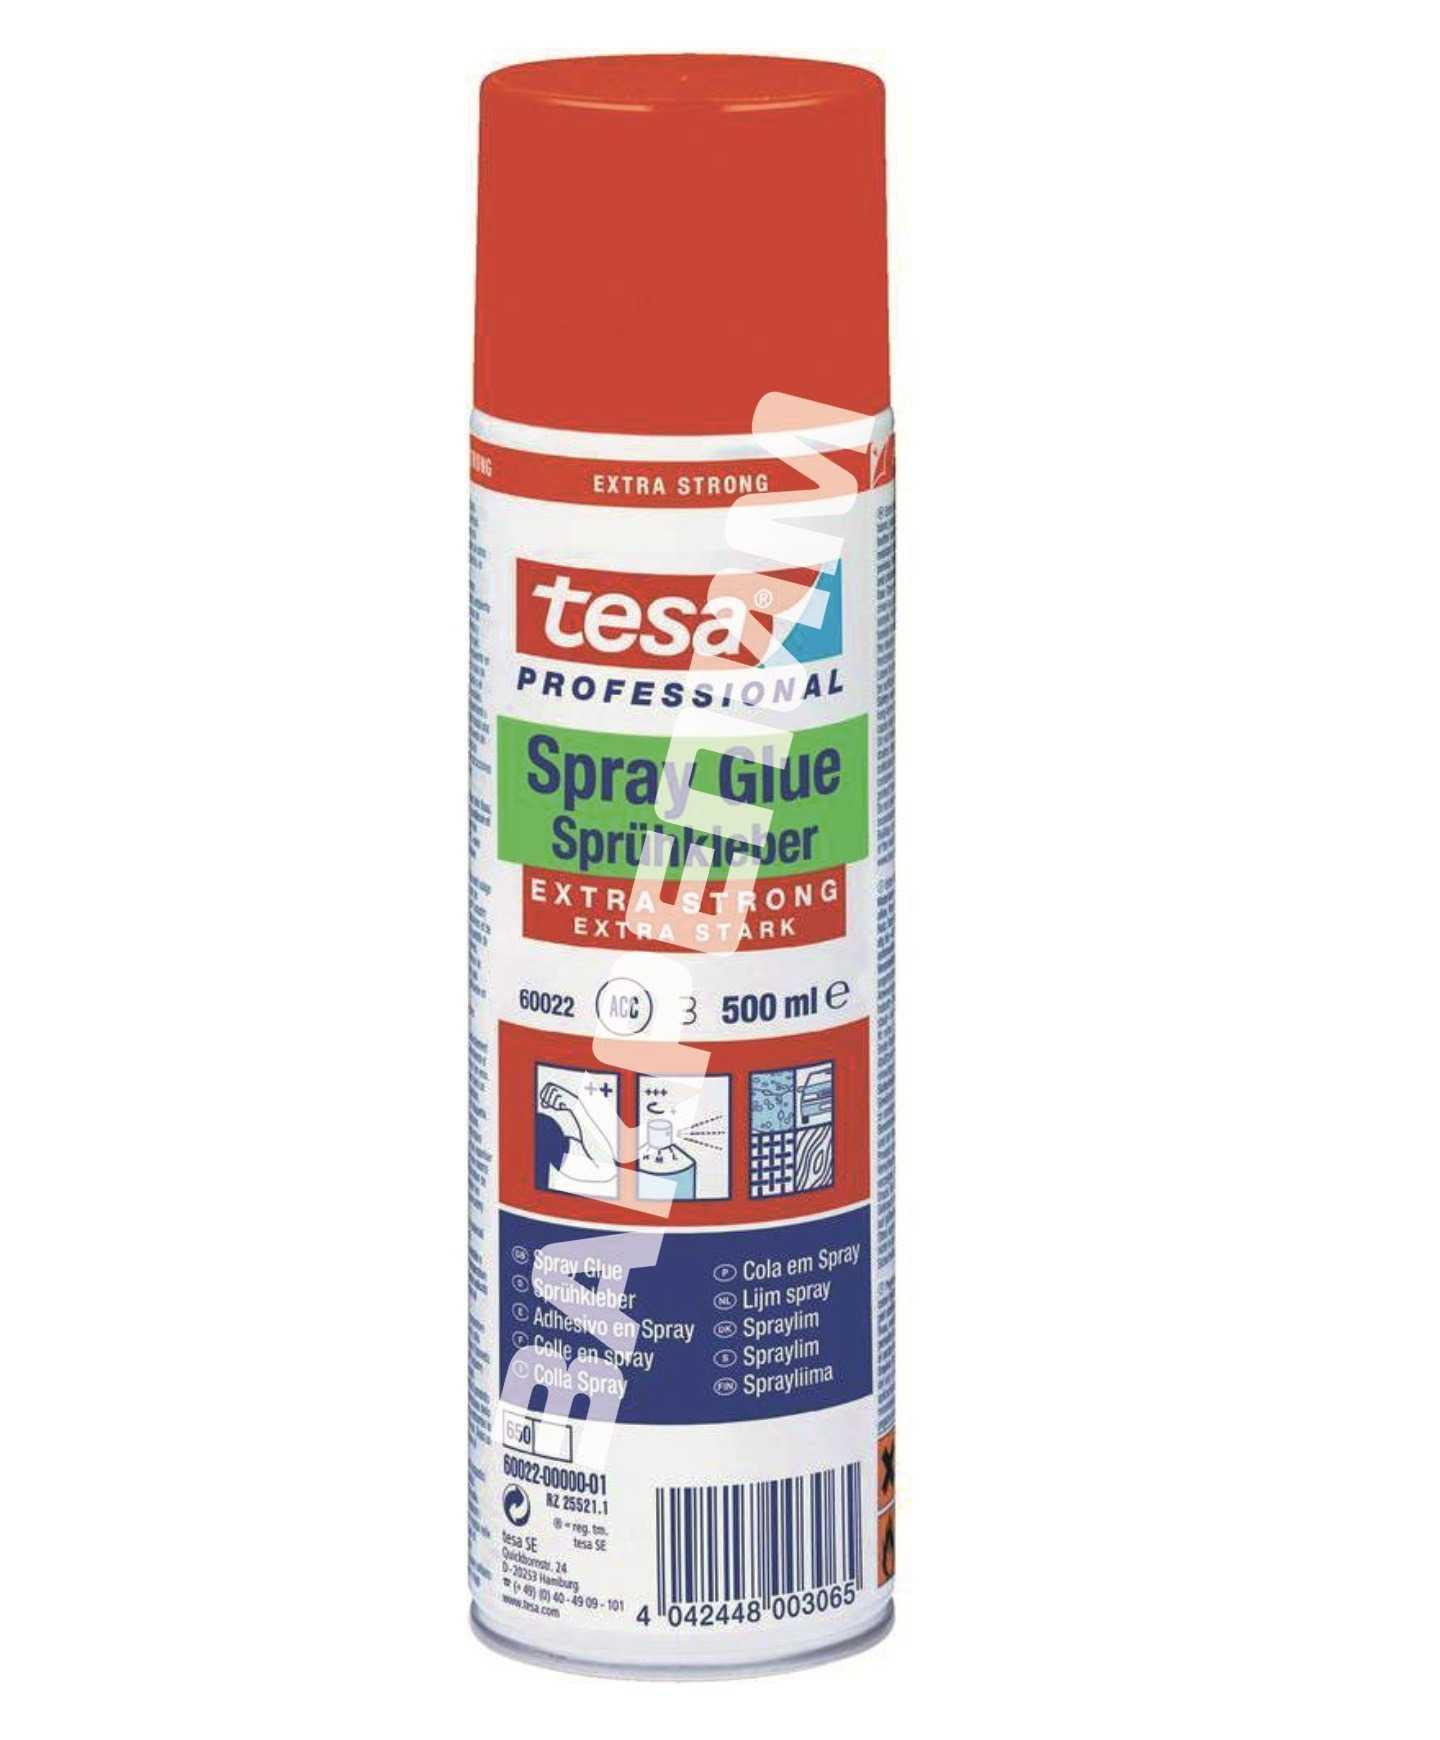 tesa-60022